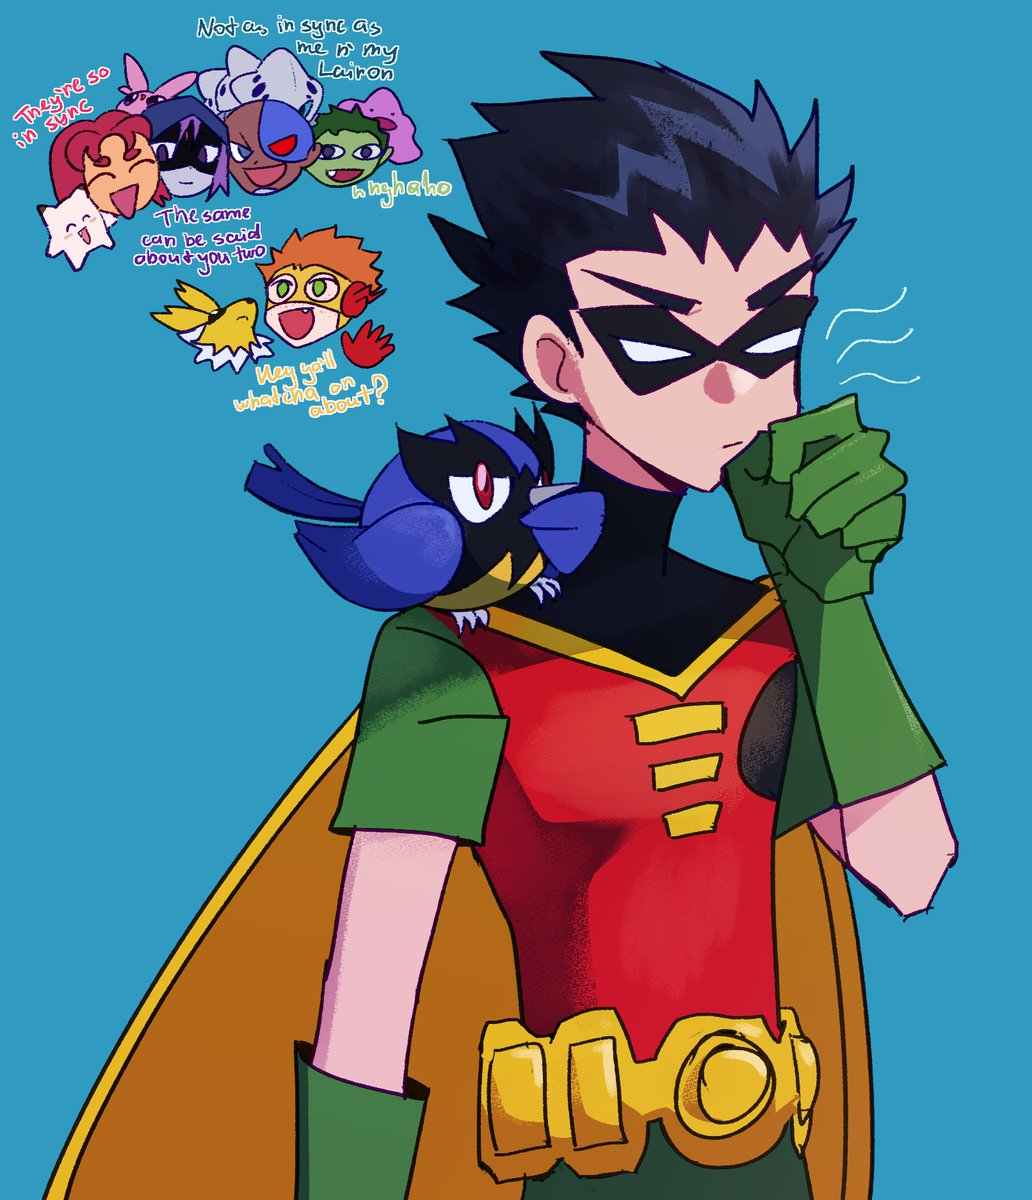 Teen titan robin without costu mm